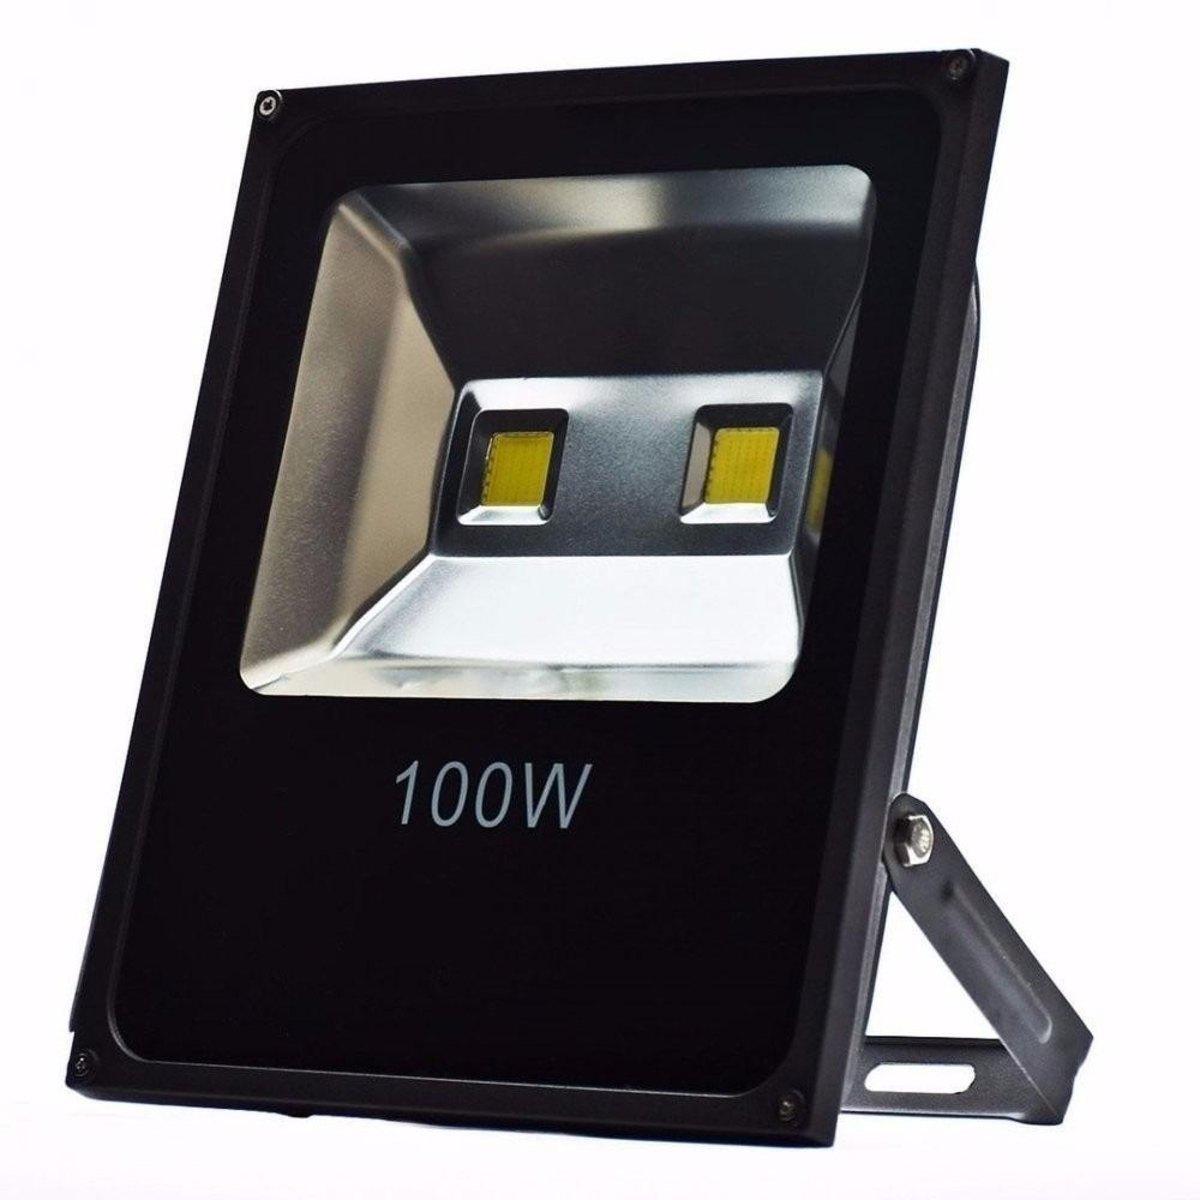 Refletor de led 100W - 6500K